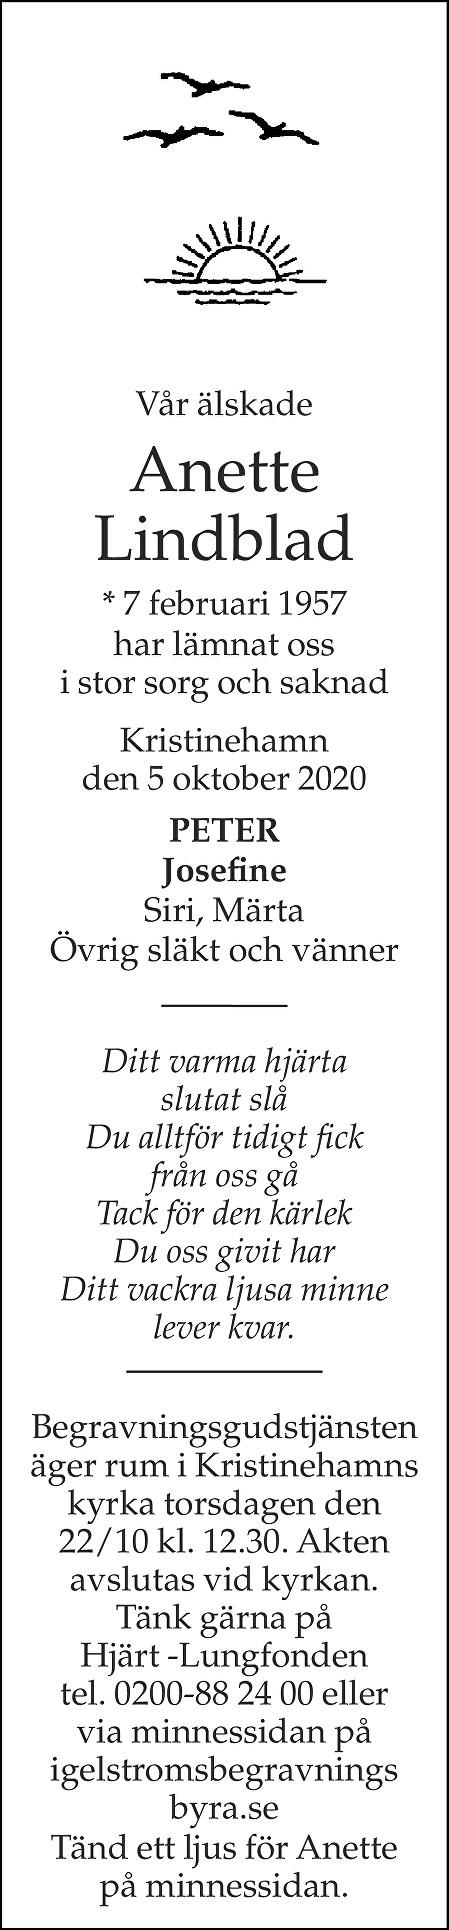 Anette Lindblad Death notice